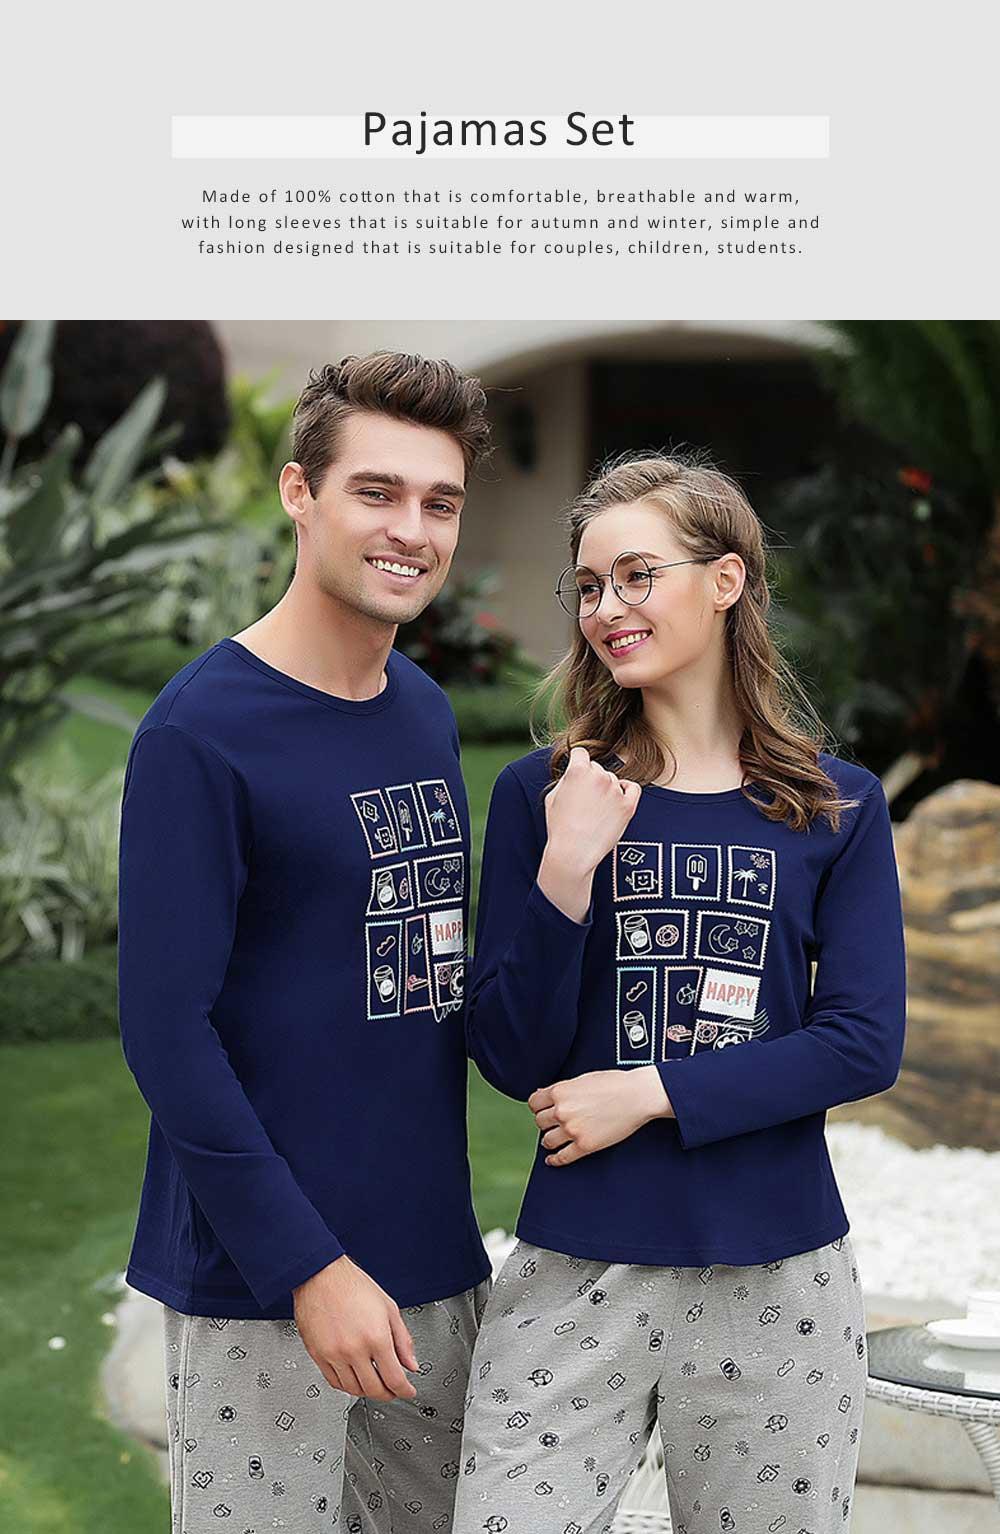 Pajamas Set for Couple, Long Sleeve Pajama for Autumn and Winter, 100% Cotton Homewear Set, Simple Designed Sleepwear Set 0